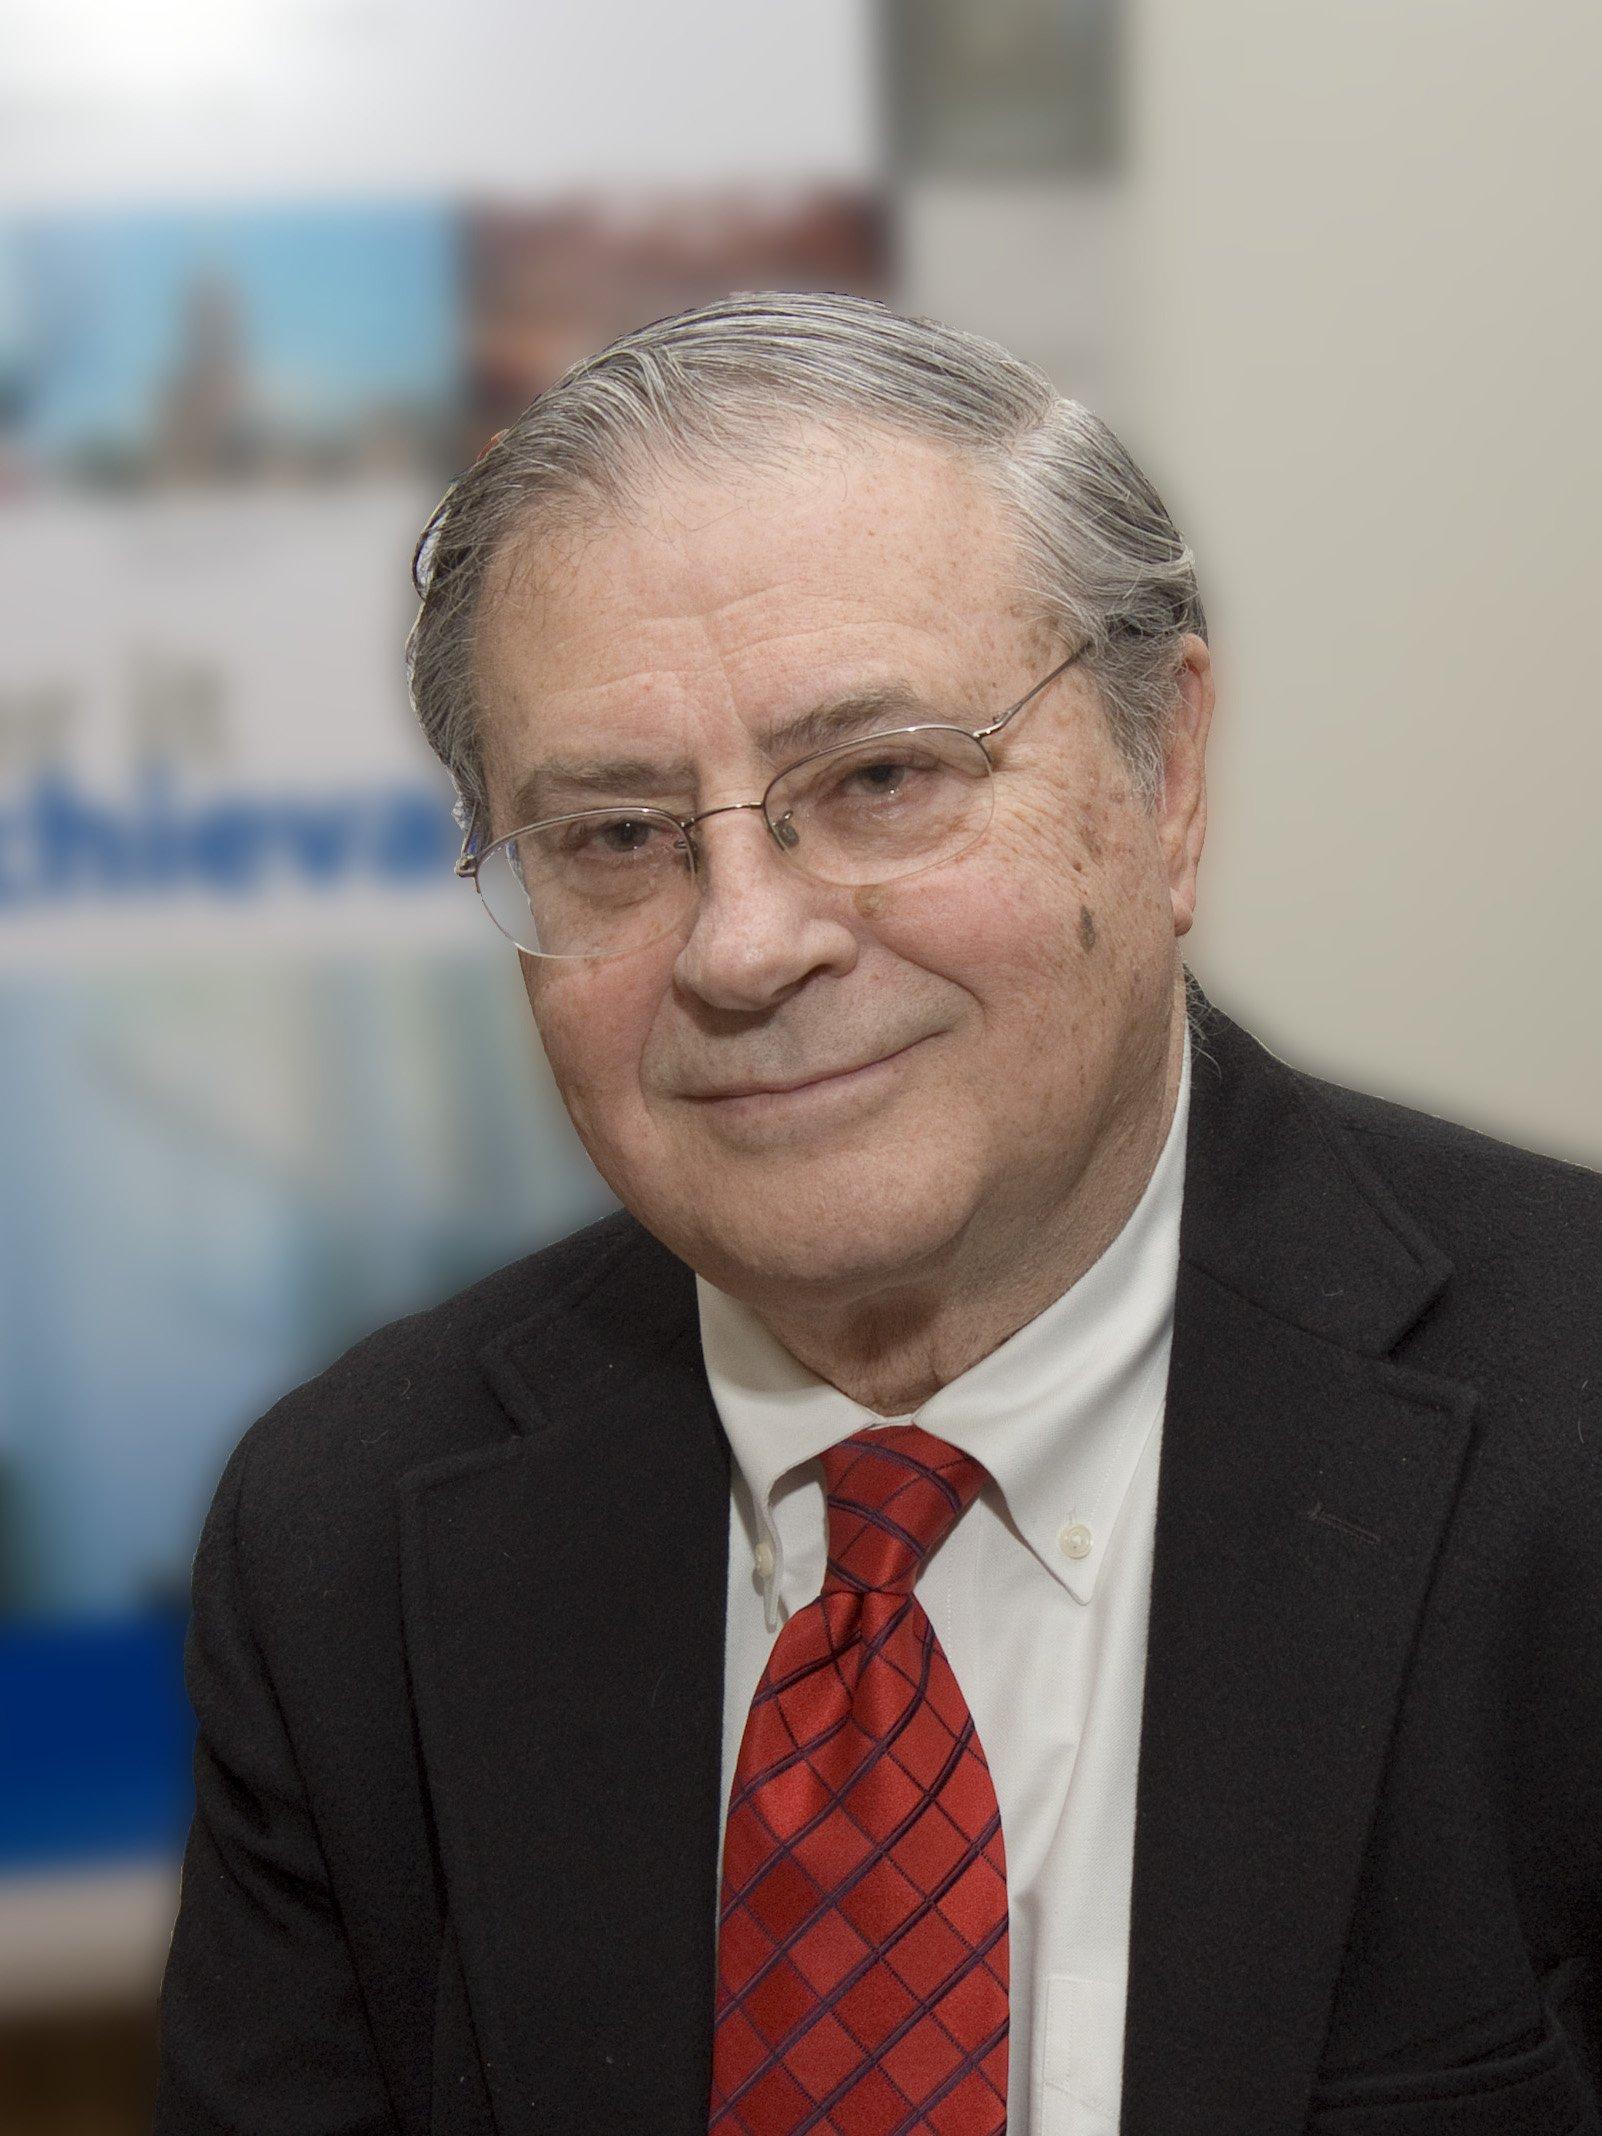 Kenneth Gibble